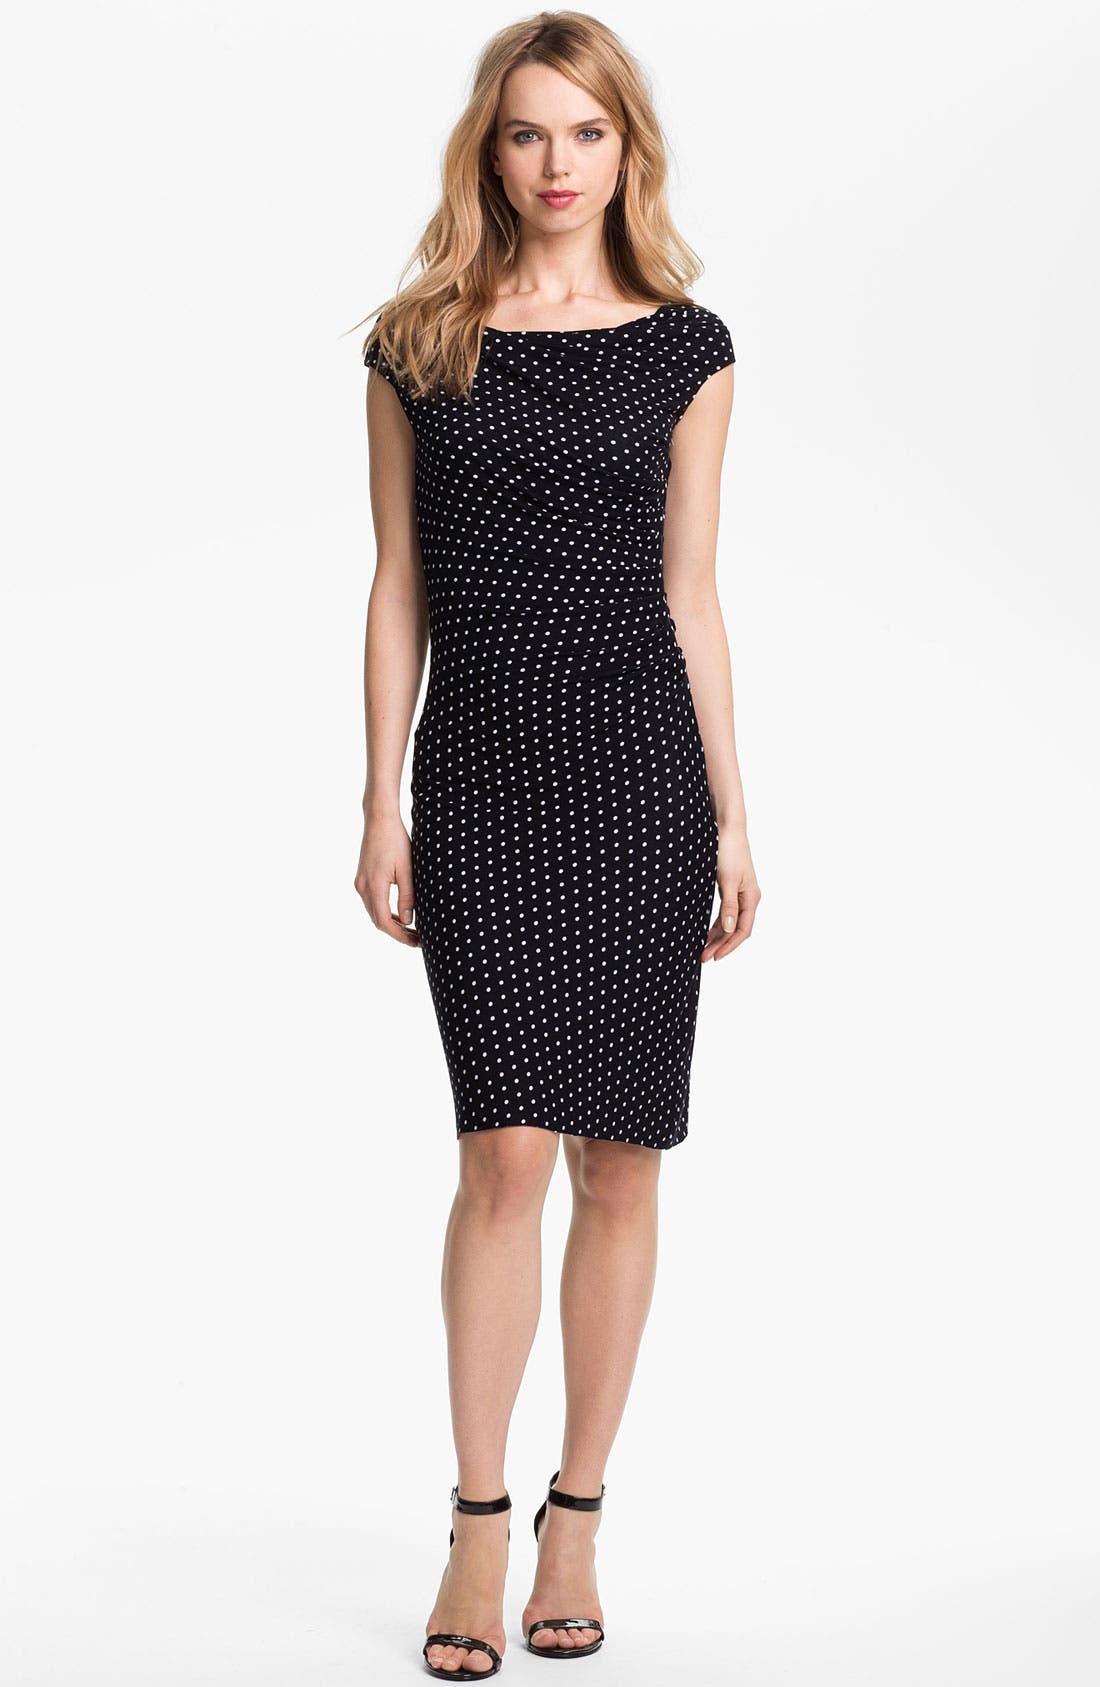 Main Image - Vince Camuto Dot Print Ruched Dress